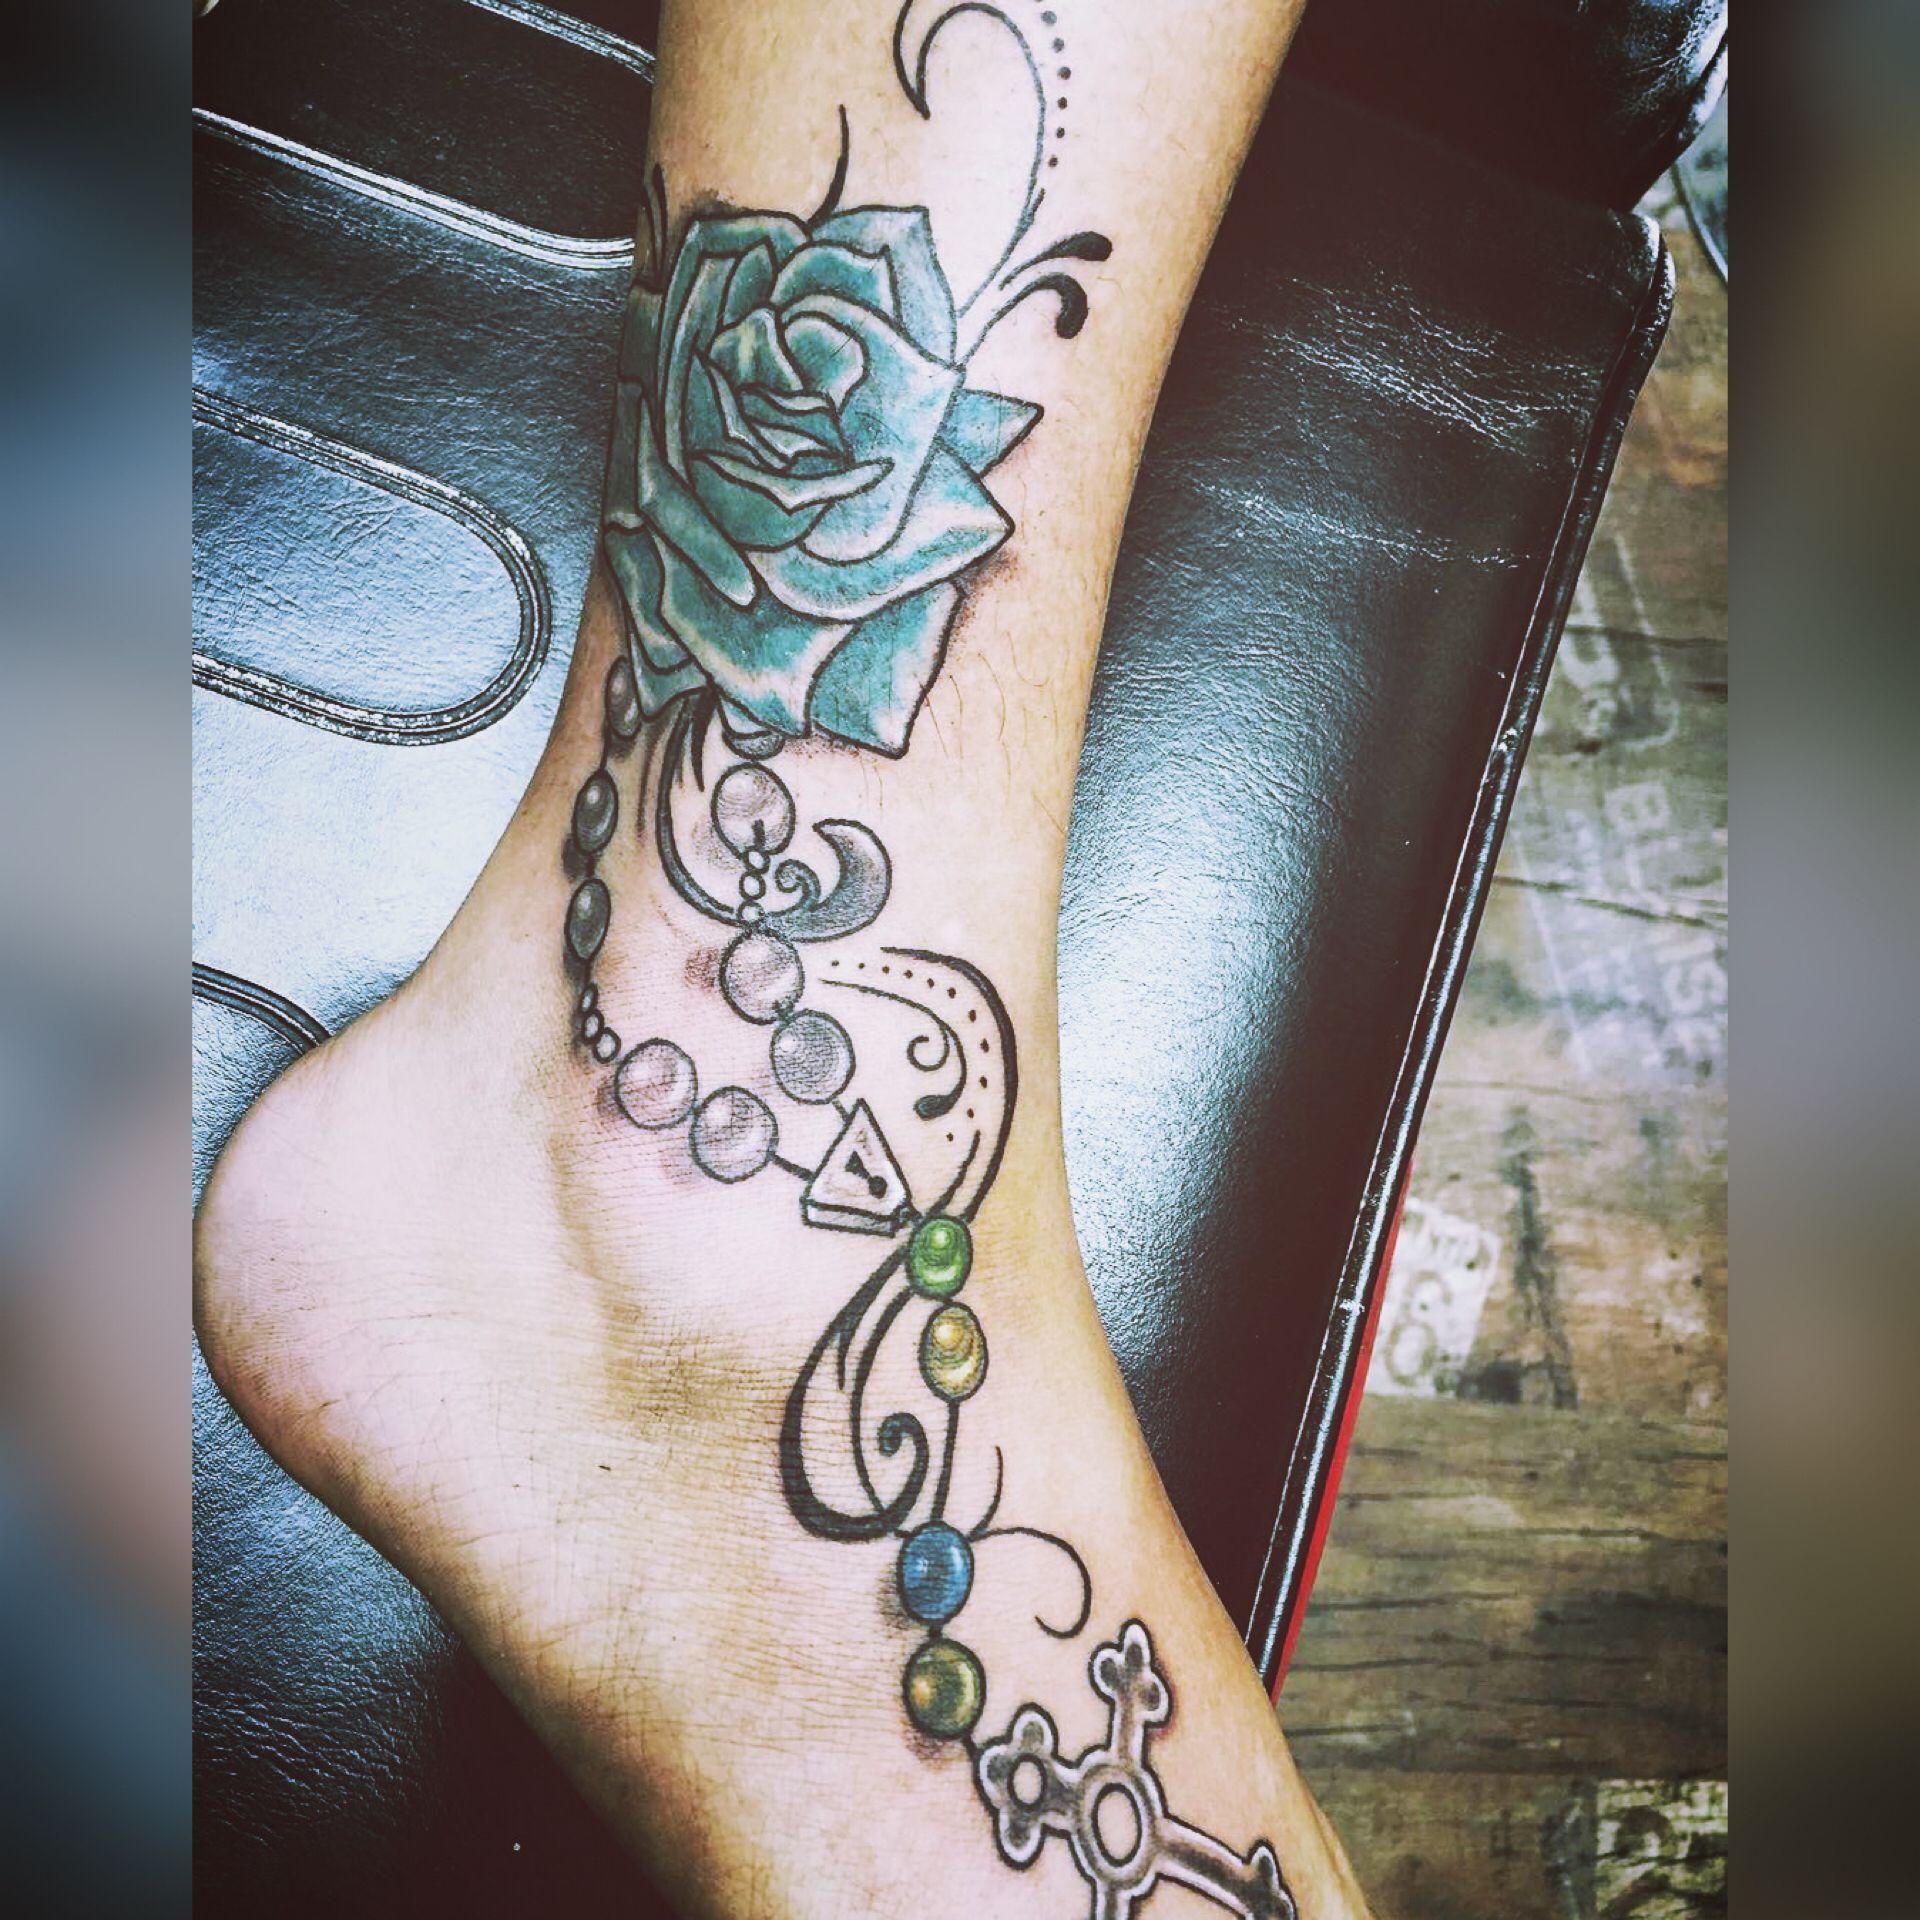 tatouage cheville femme photo astral projection definition